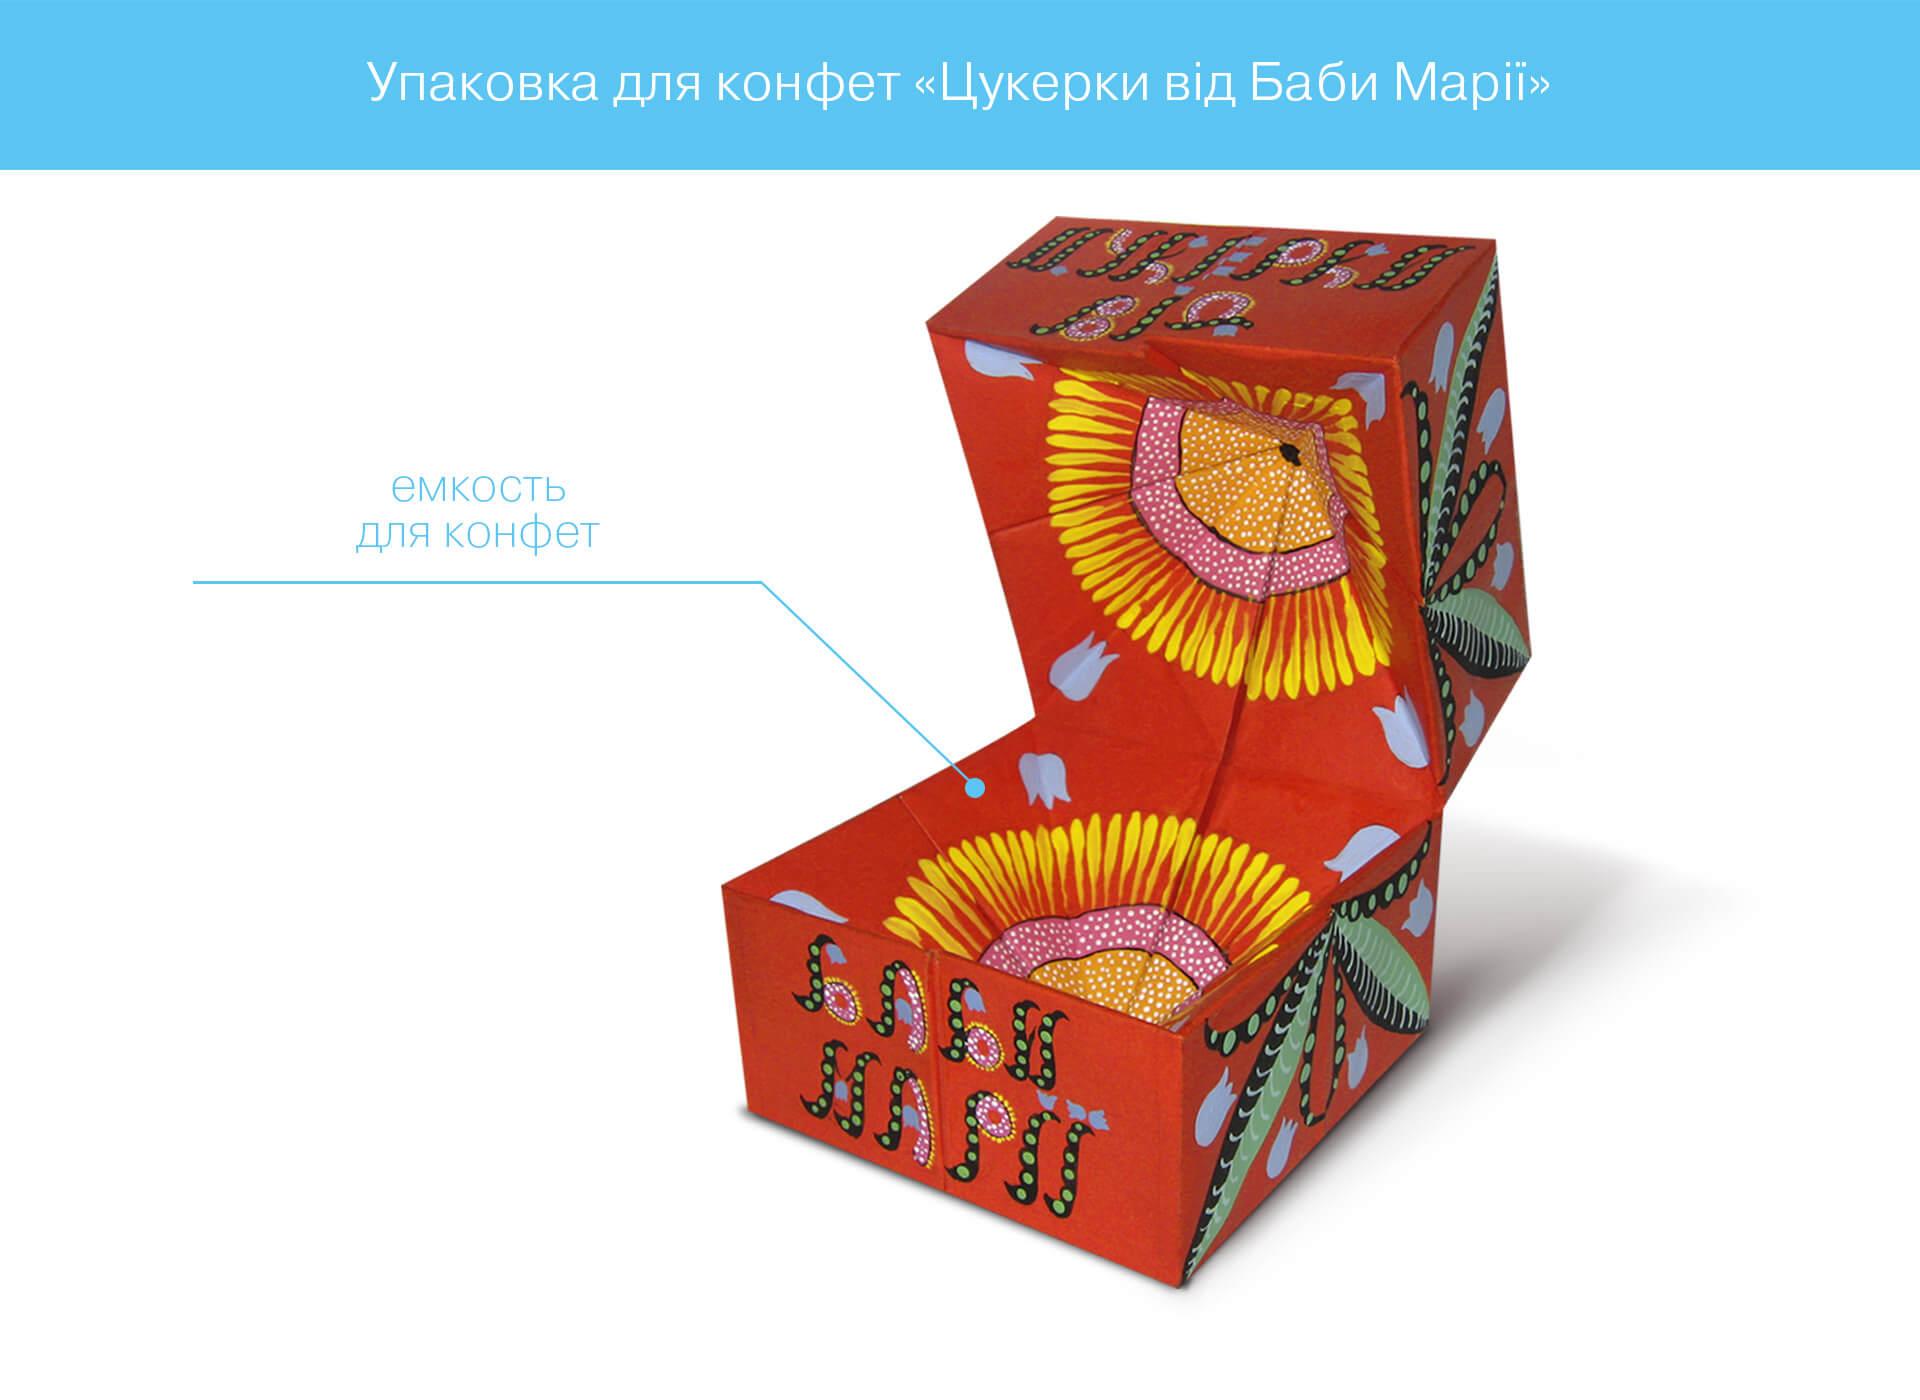 Prokochuk_Irina_Packing Tsukerki od Babi Marії_